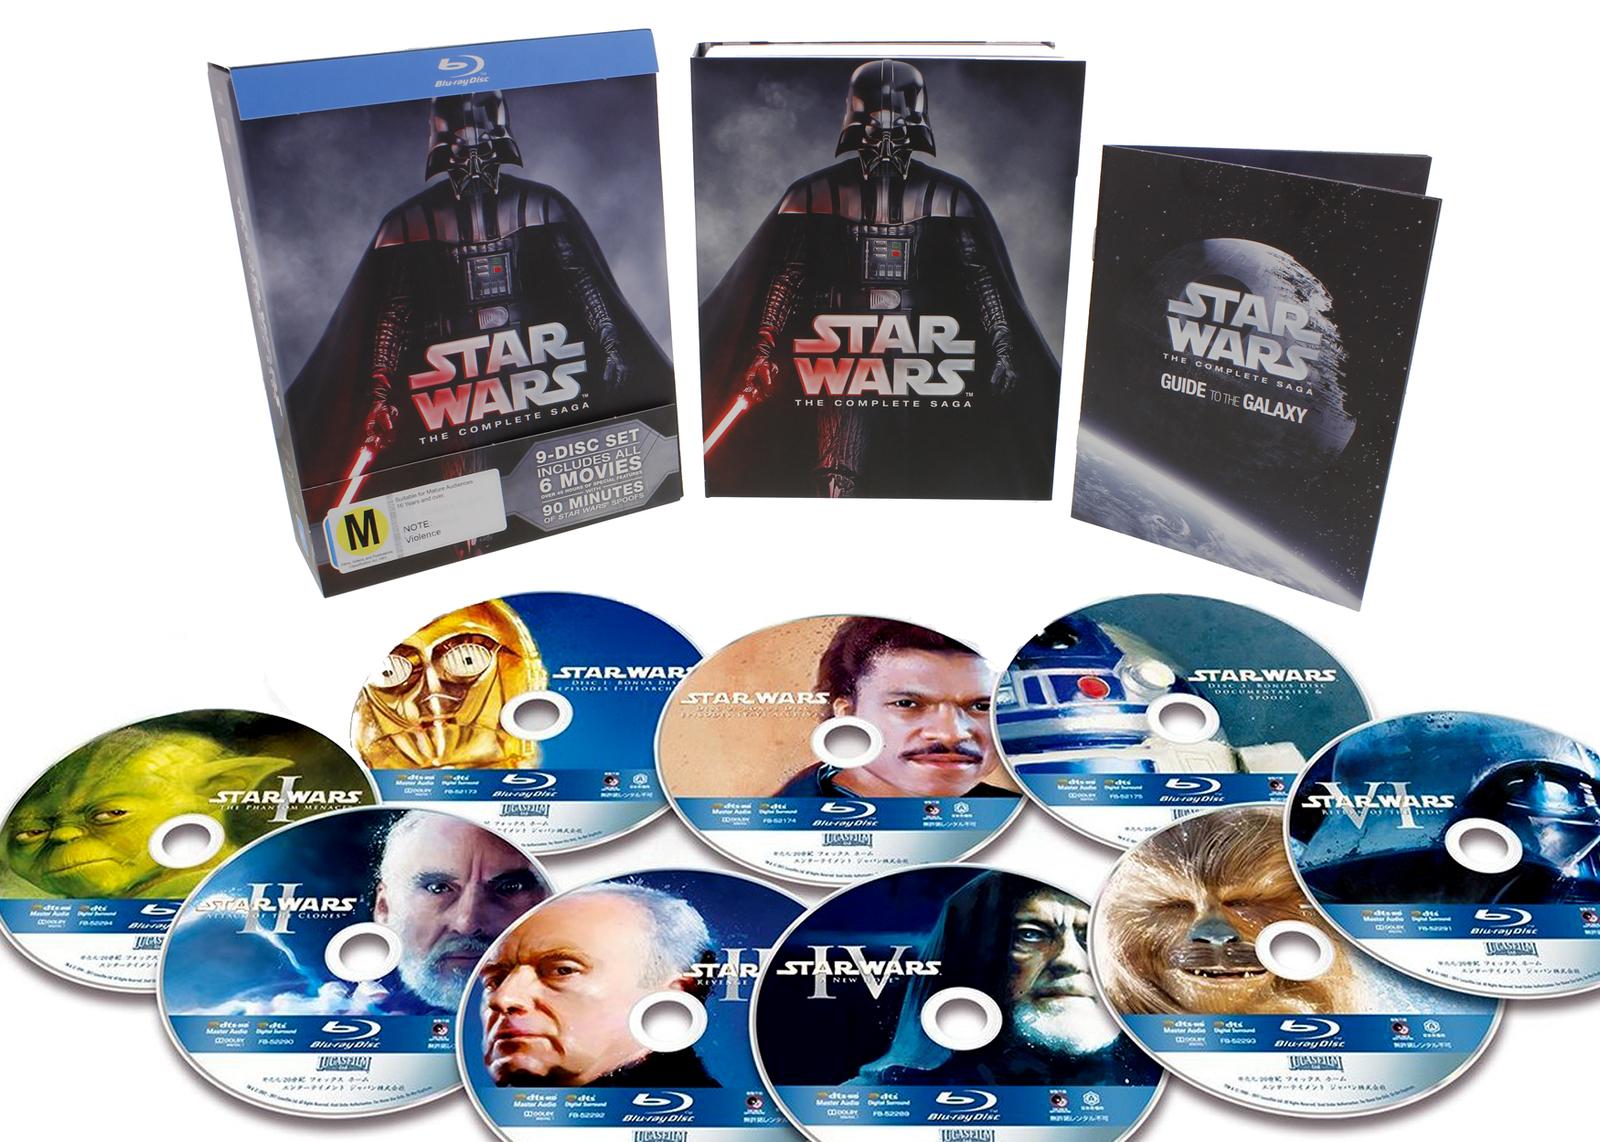 Star Wars - The Complete Saga on Blu-ray image